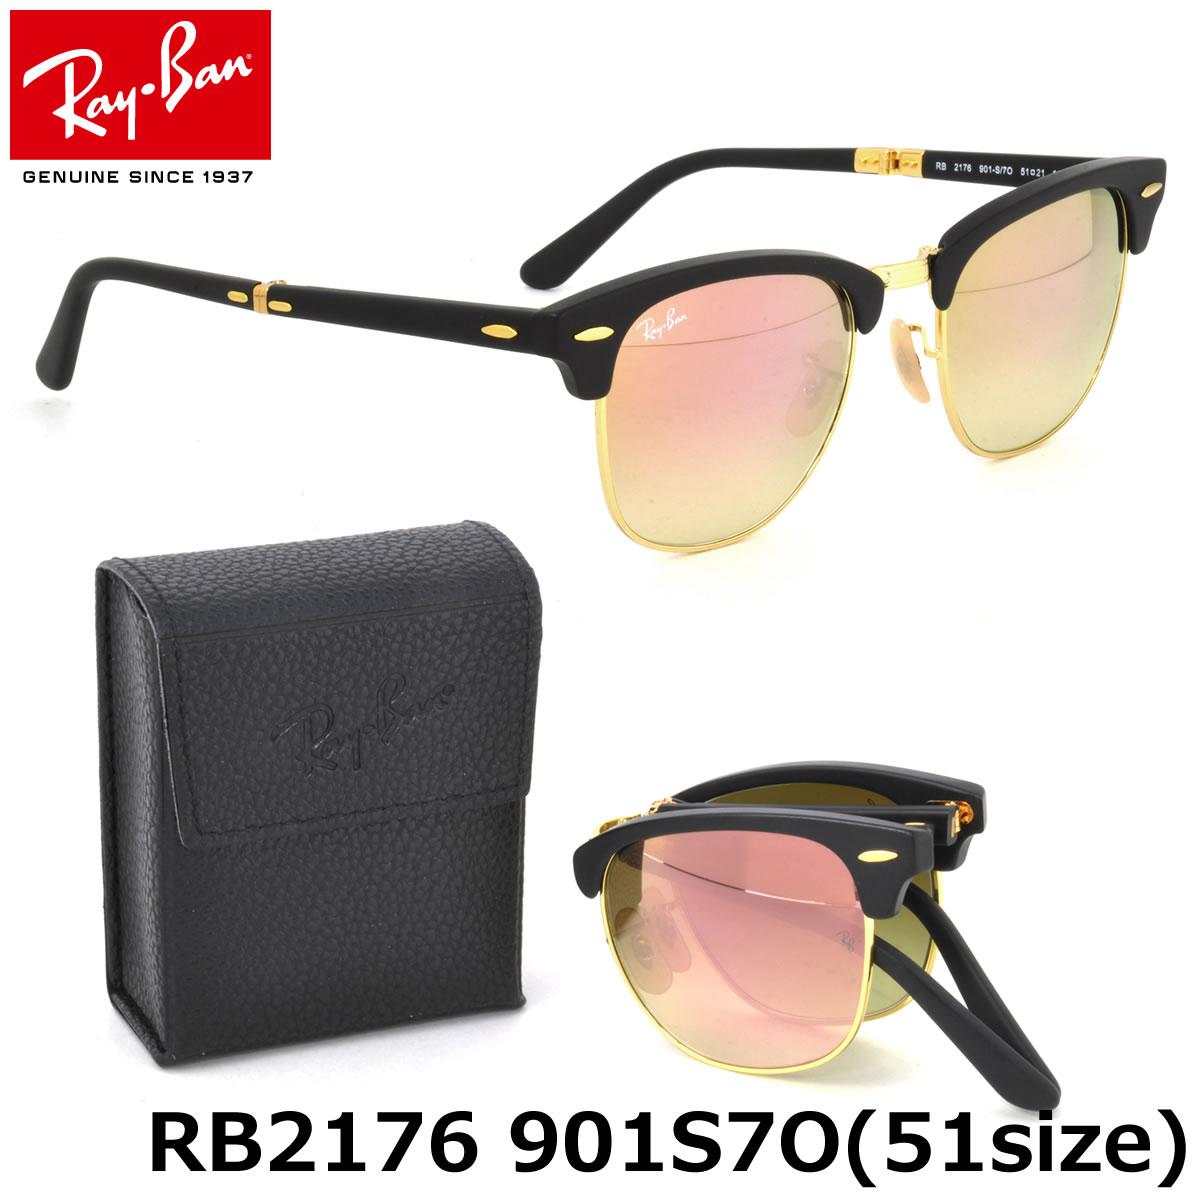 fdd015e1a27 Ray-ban Rb2176 901 Polarized Brown Gradient